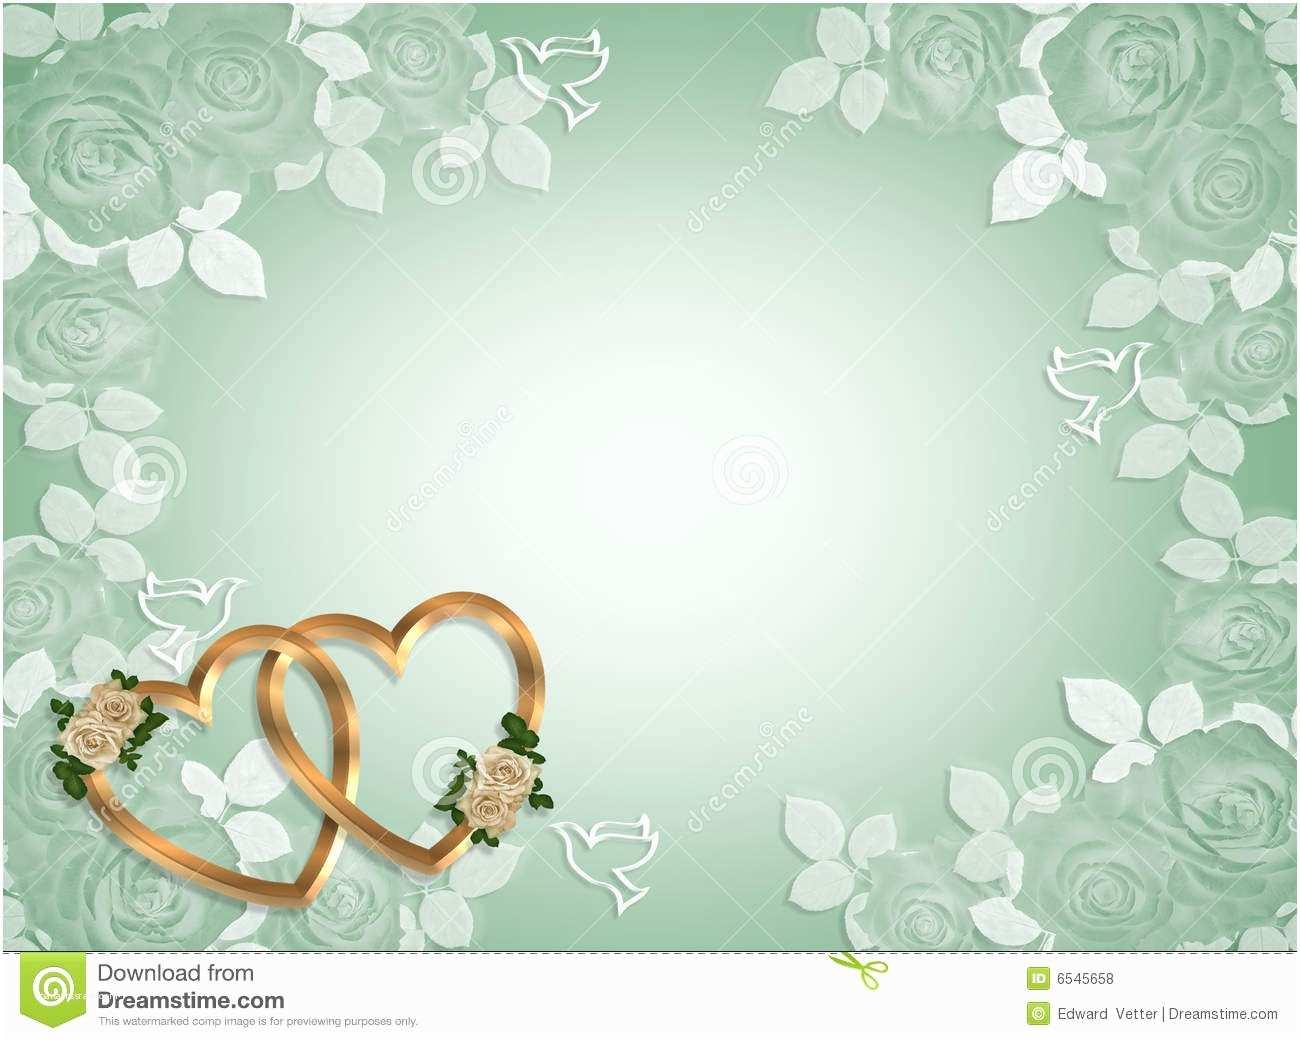 Free Wedding Invitation Templates top Pilation Wedding Invitation Templates Free